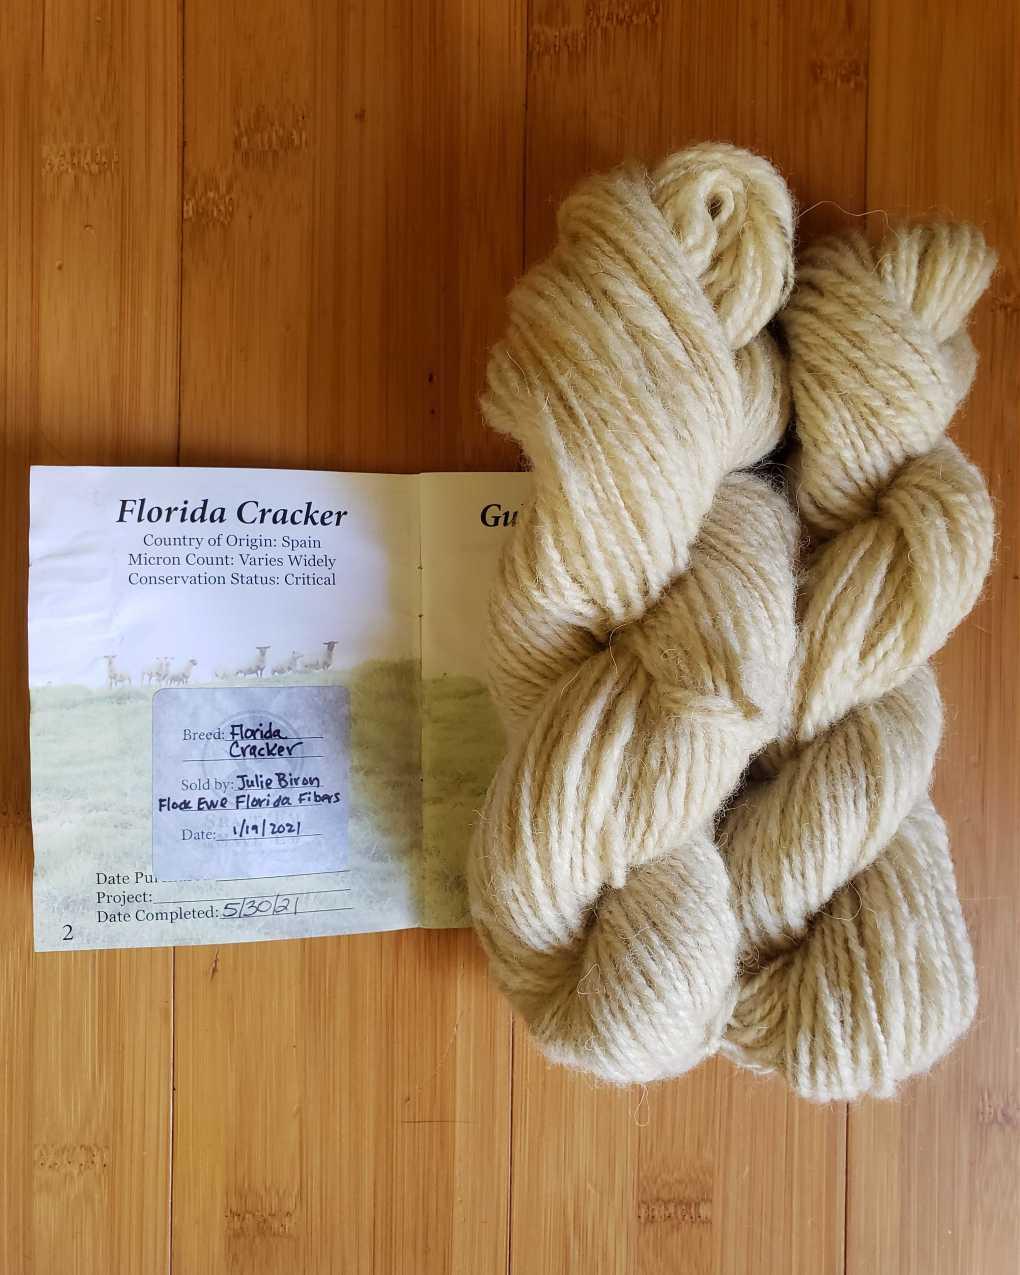 Two skeins of handspun Florida Cracker yarn next to a stamped SE2SE passport page.